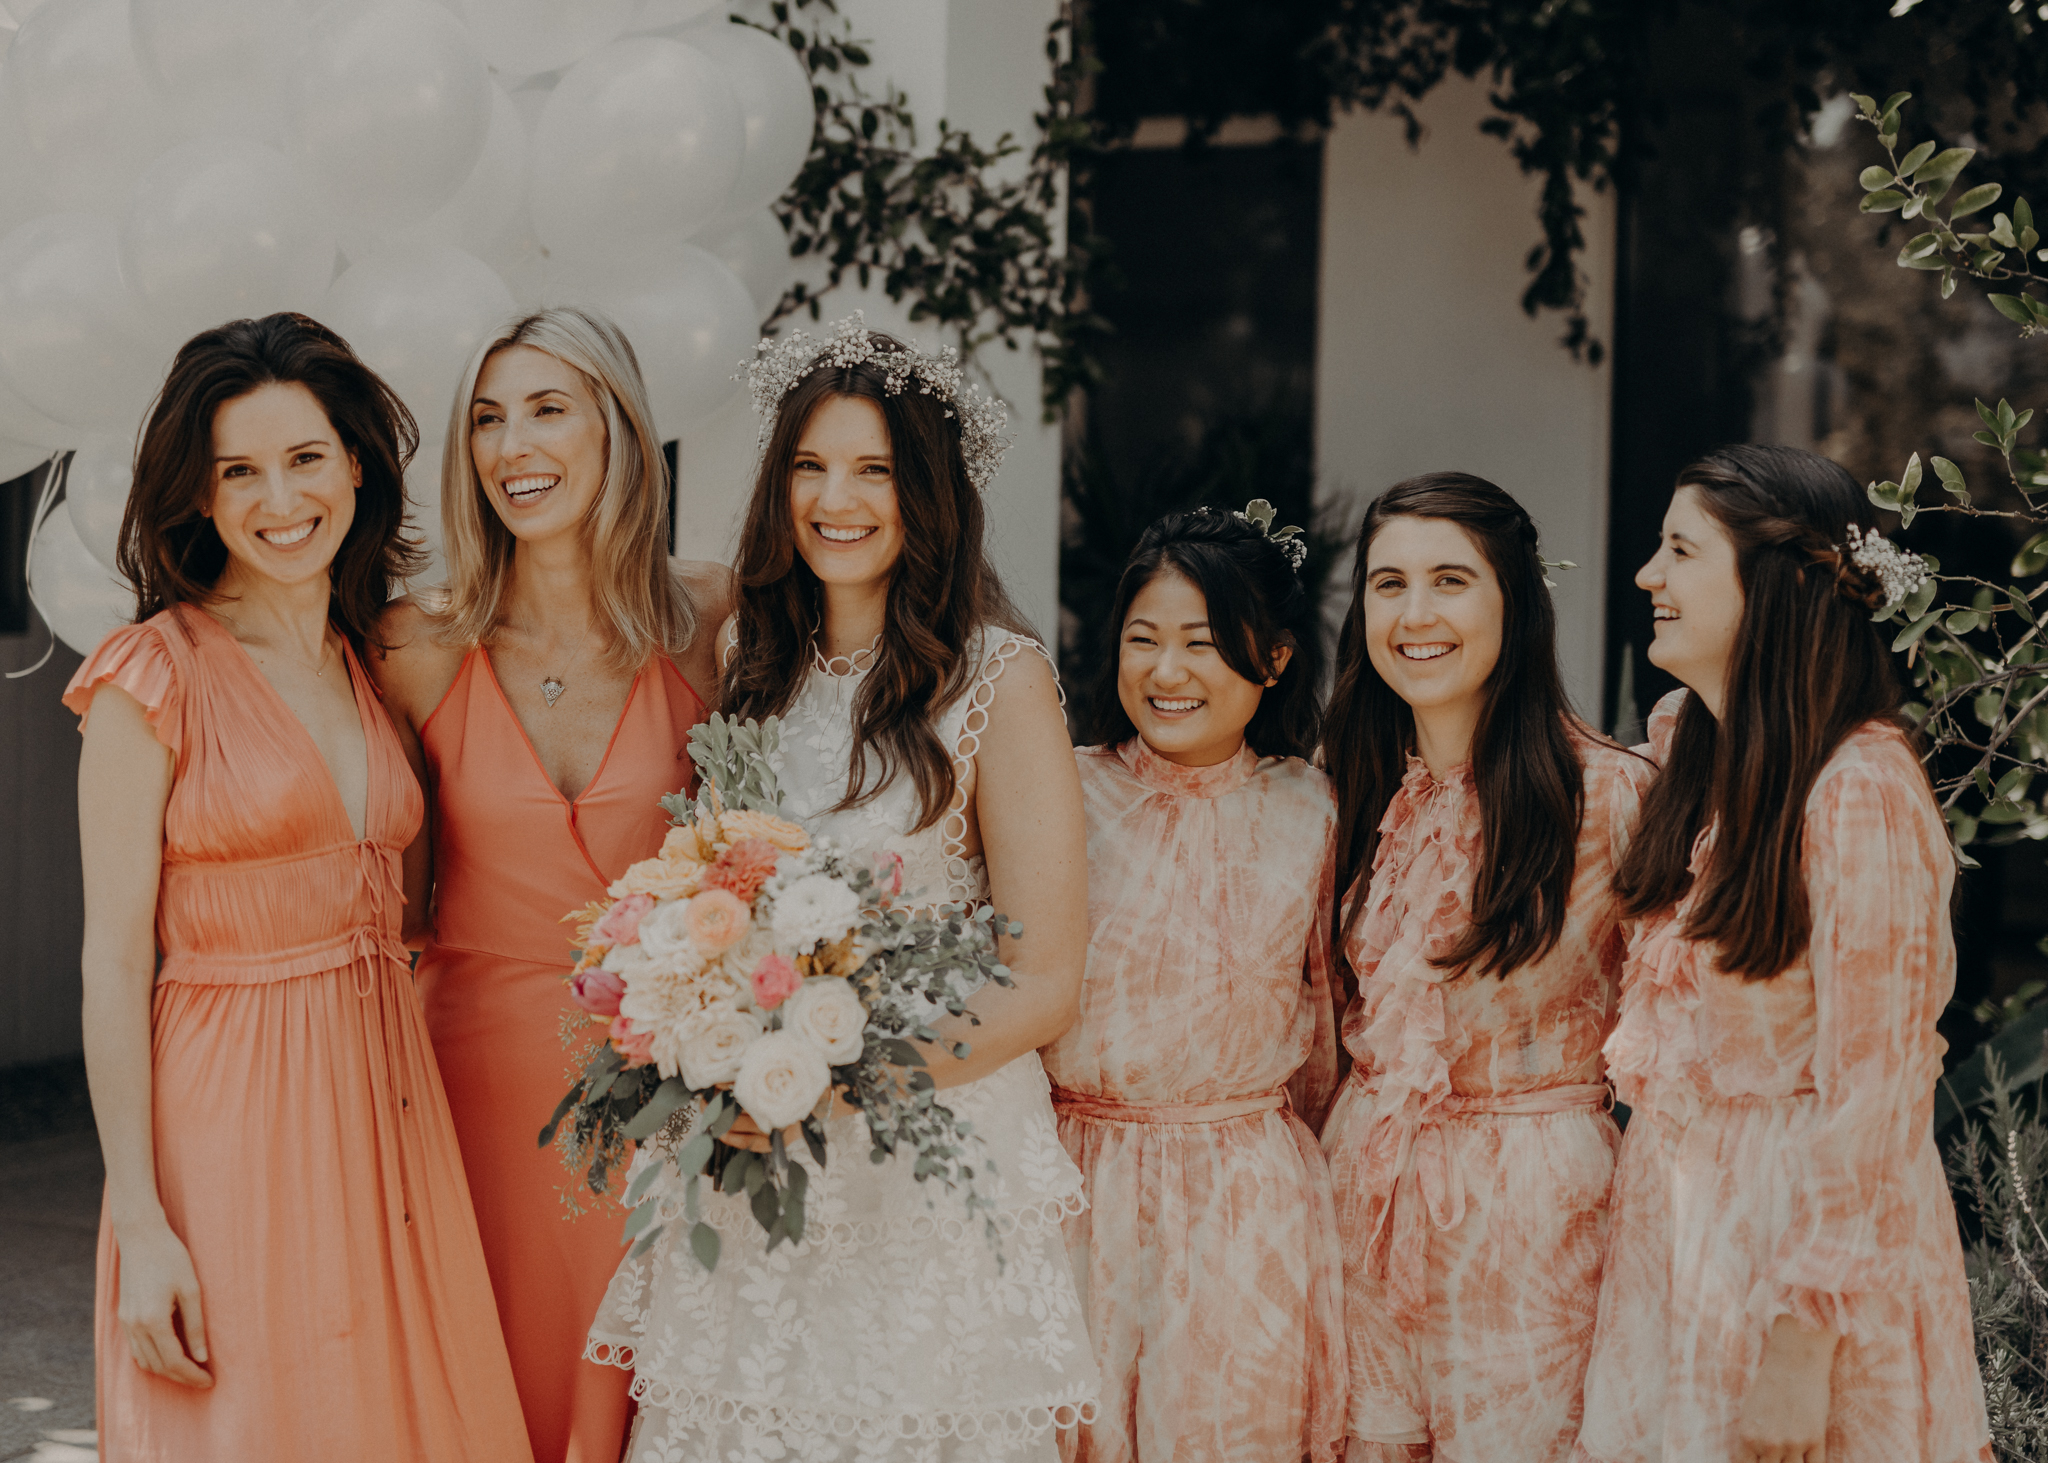 Isaiah + Taylor Photography - Private Estate Backyard Wedding - Beverly Hills - Los Angeles Wedding Photographer - 48.jpg